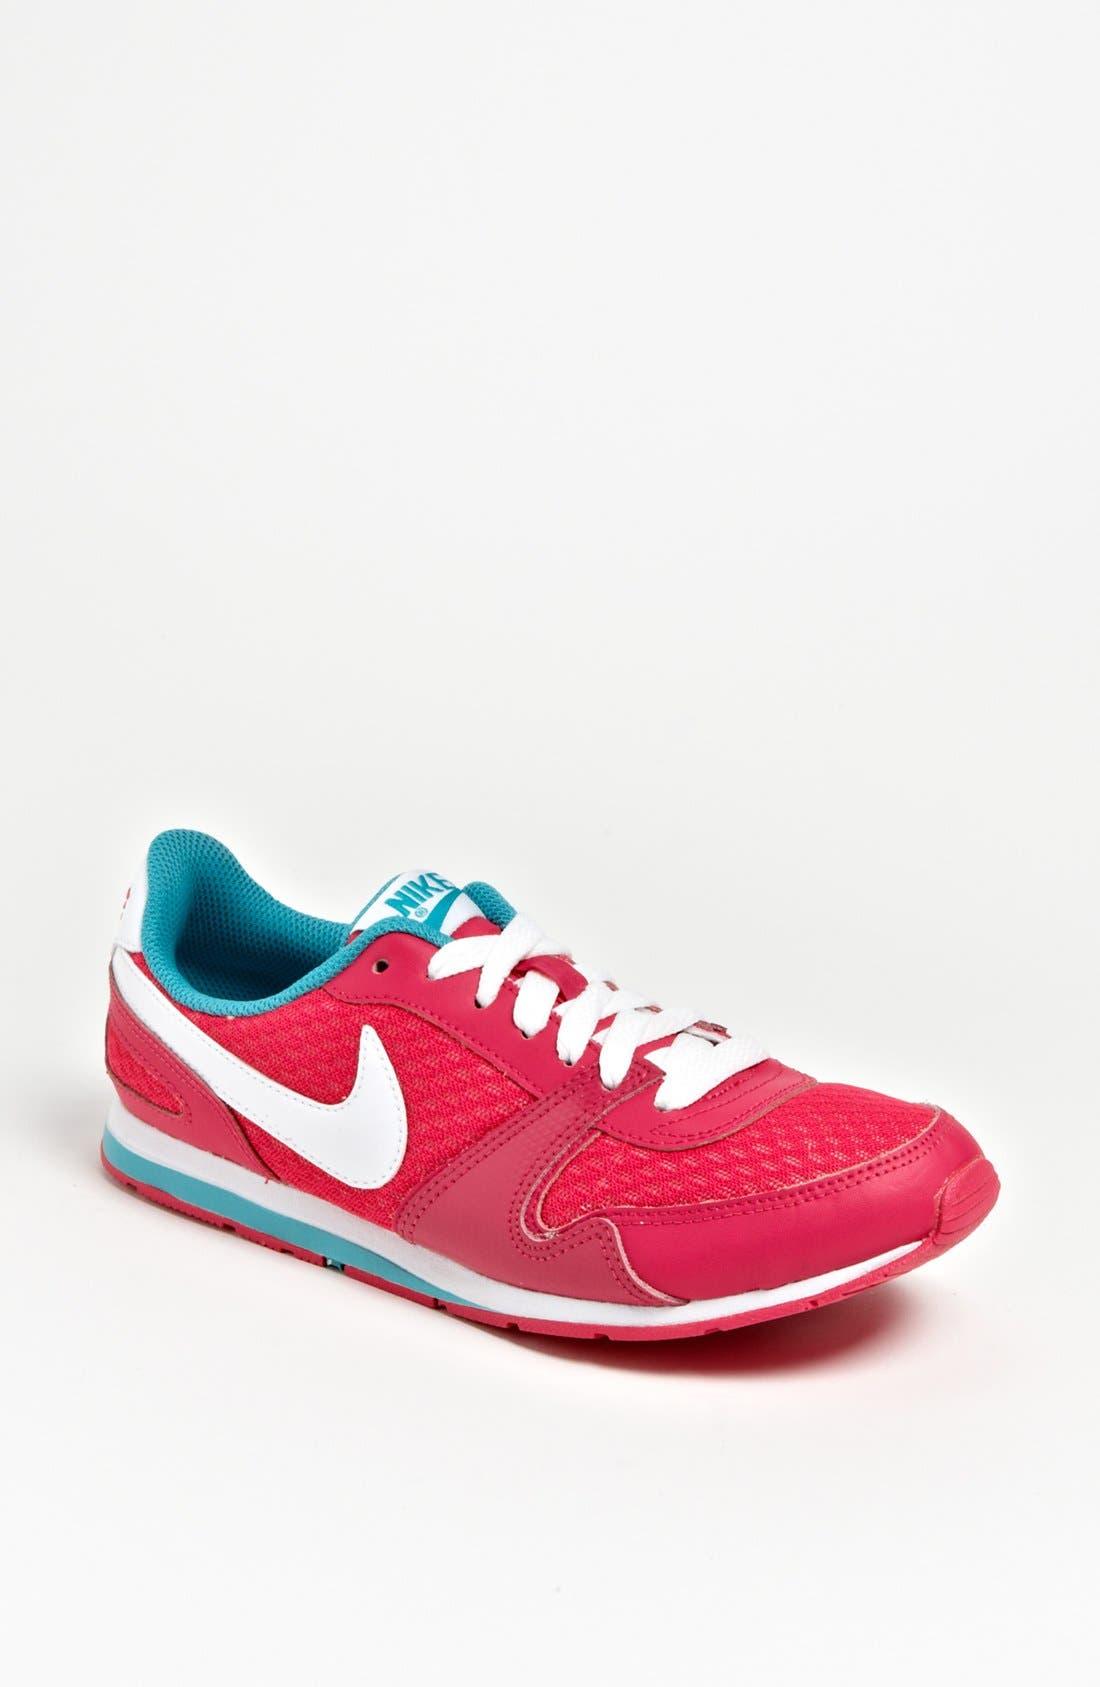 Alternate Image 1 Selected - Nike 'Eclipse II' Sneaker (Women)